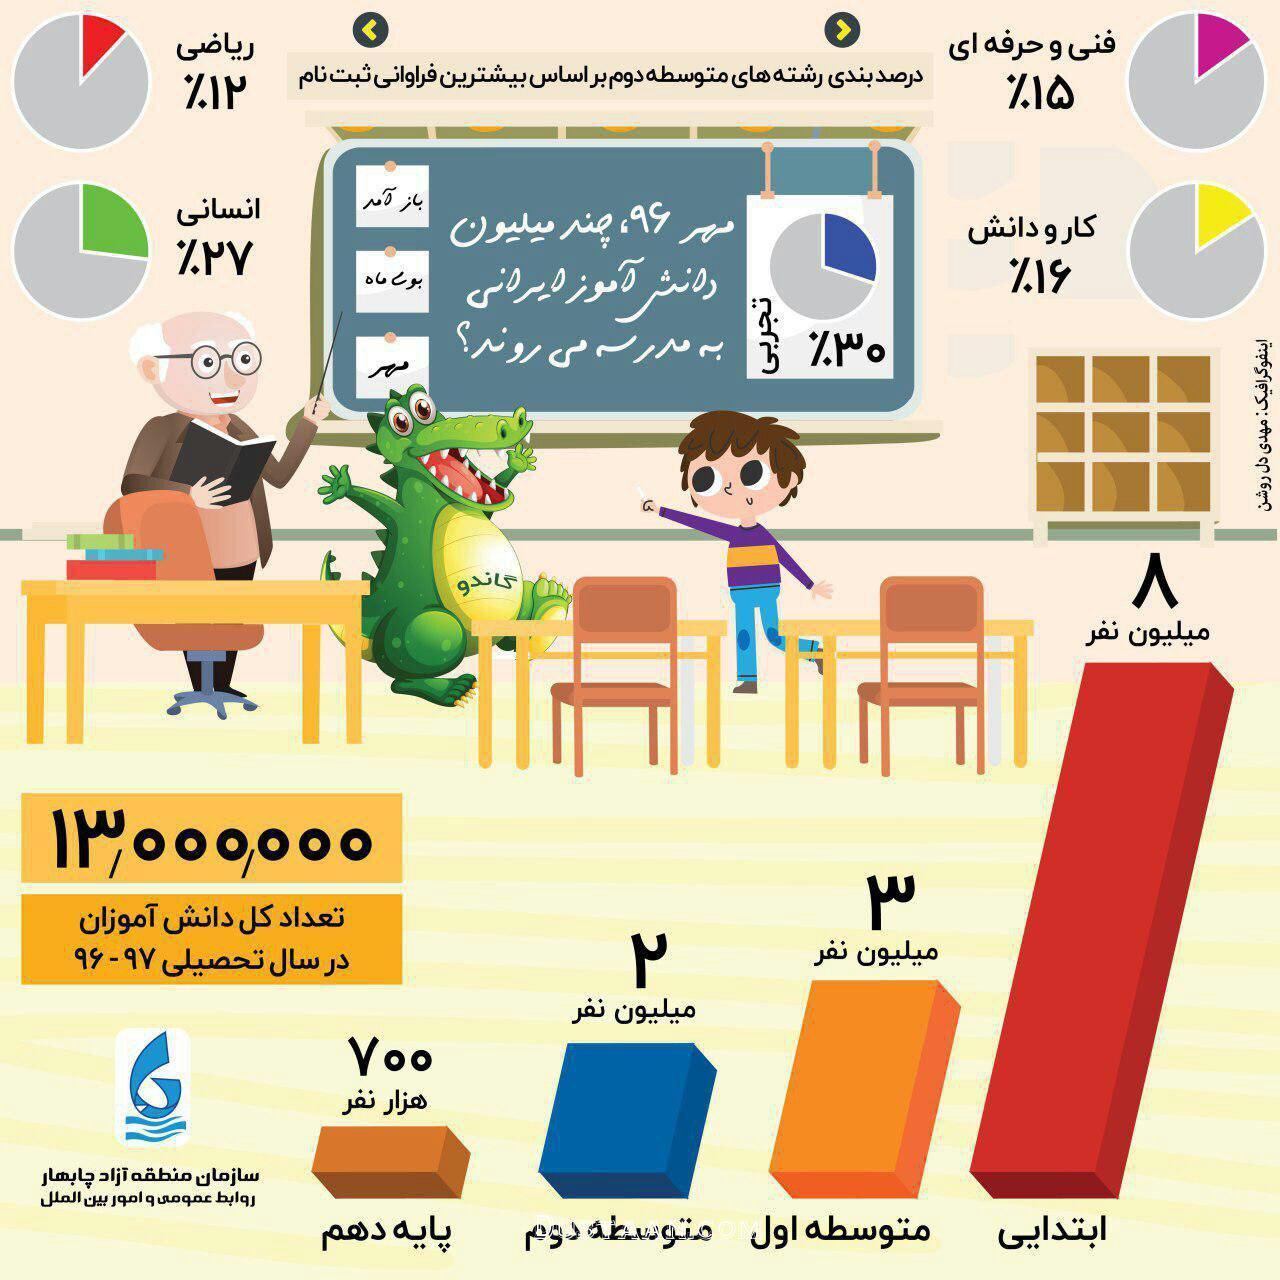 www.dustaan.com مهر امسال ، هر رشته چند دانش آموز دارد؟